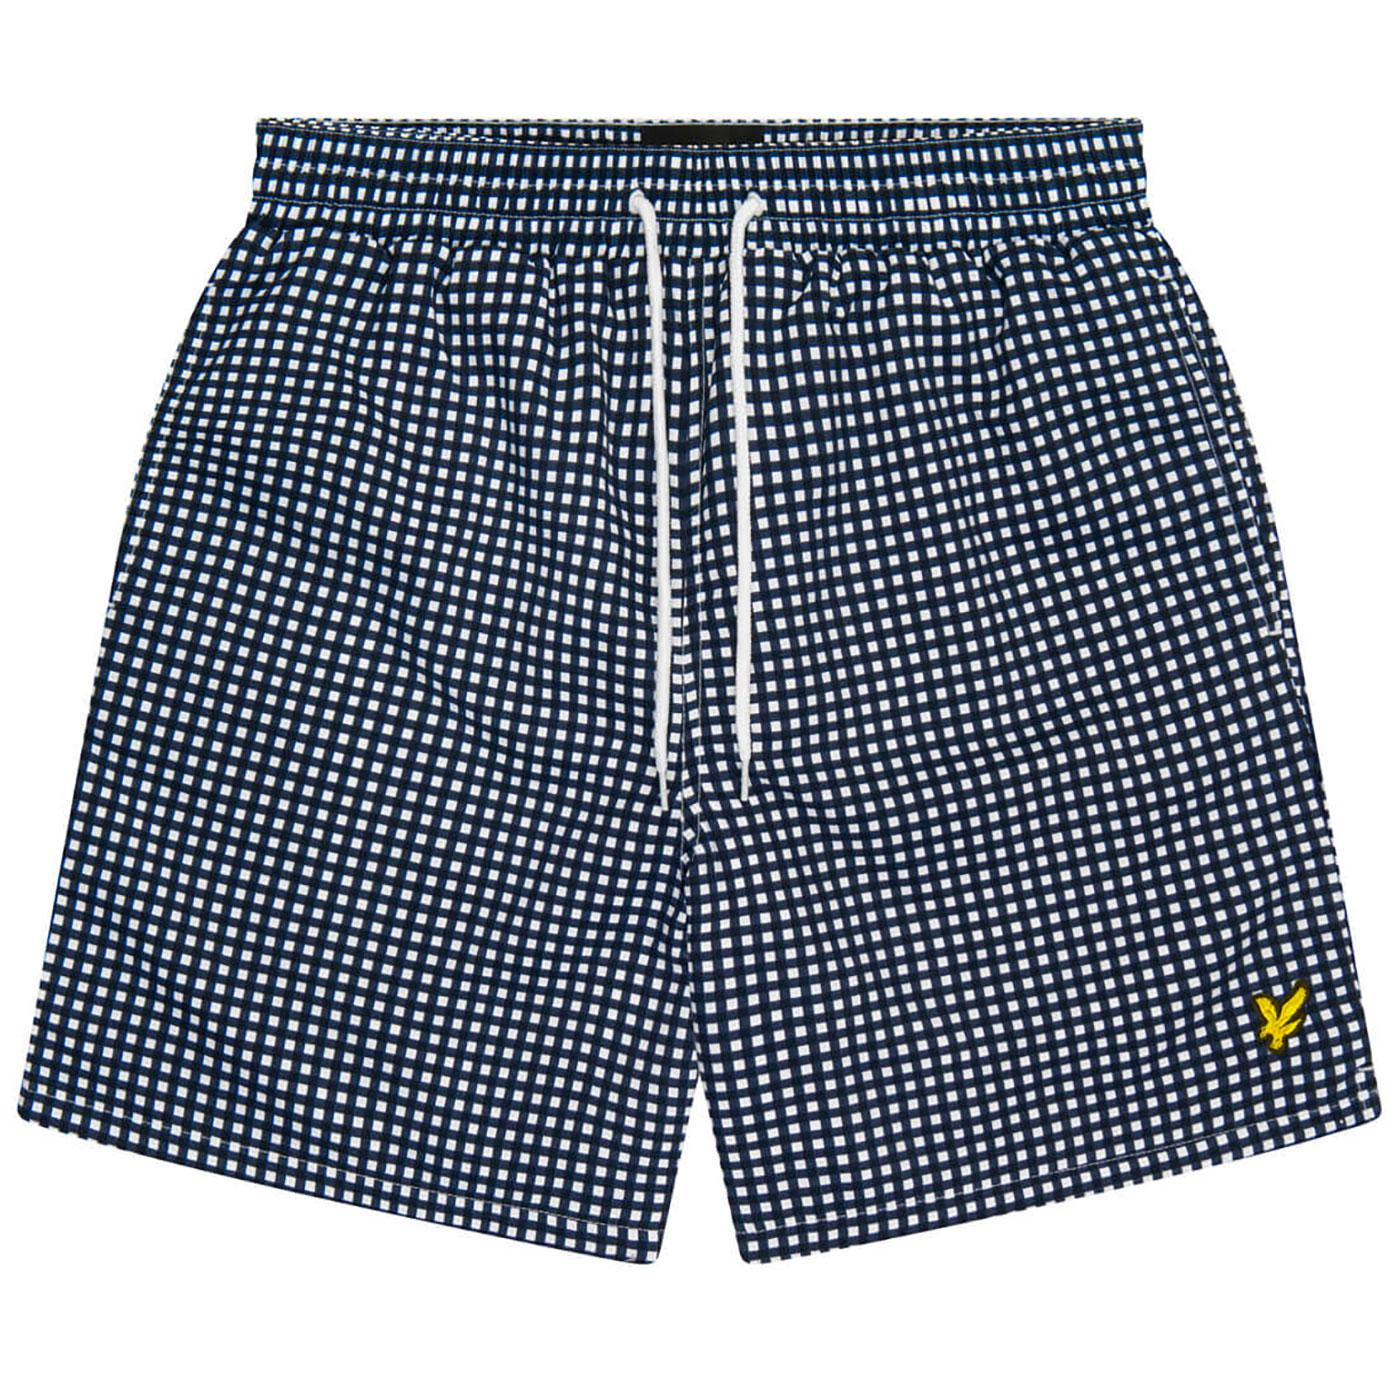 LYLE & SCOTT Men's Gingham Swim Shorts (DN)